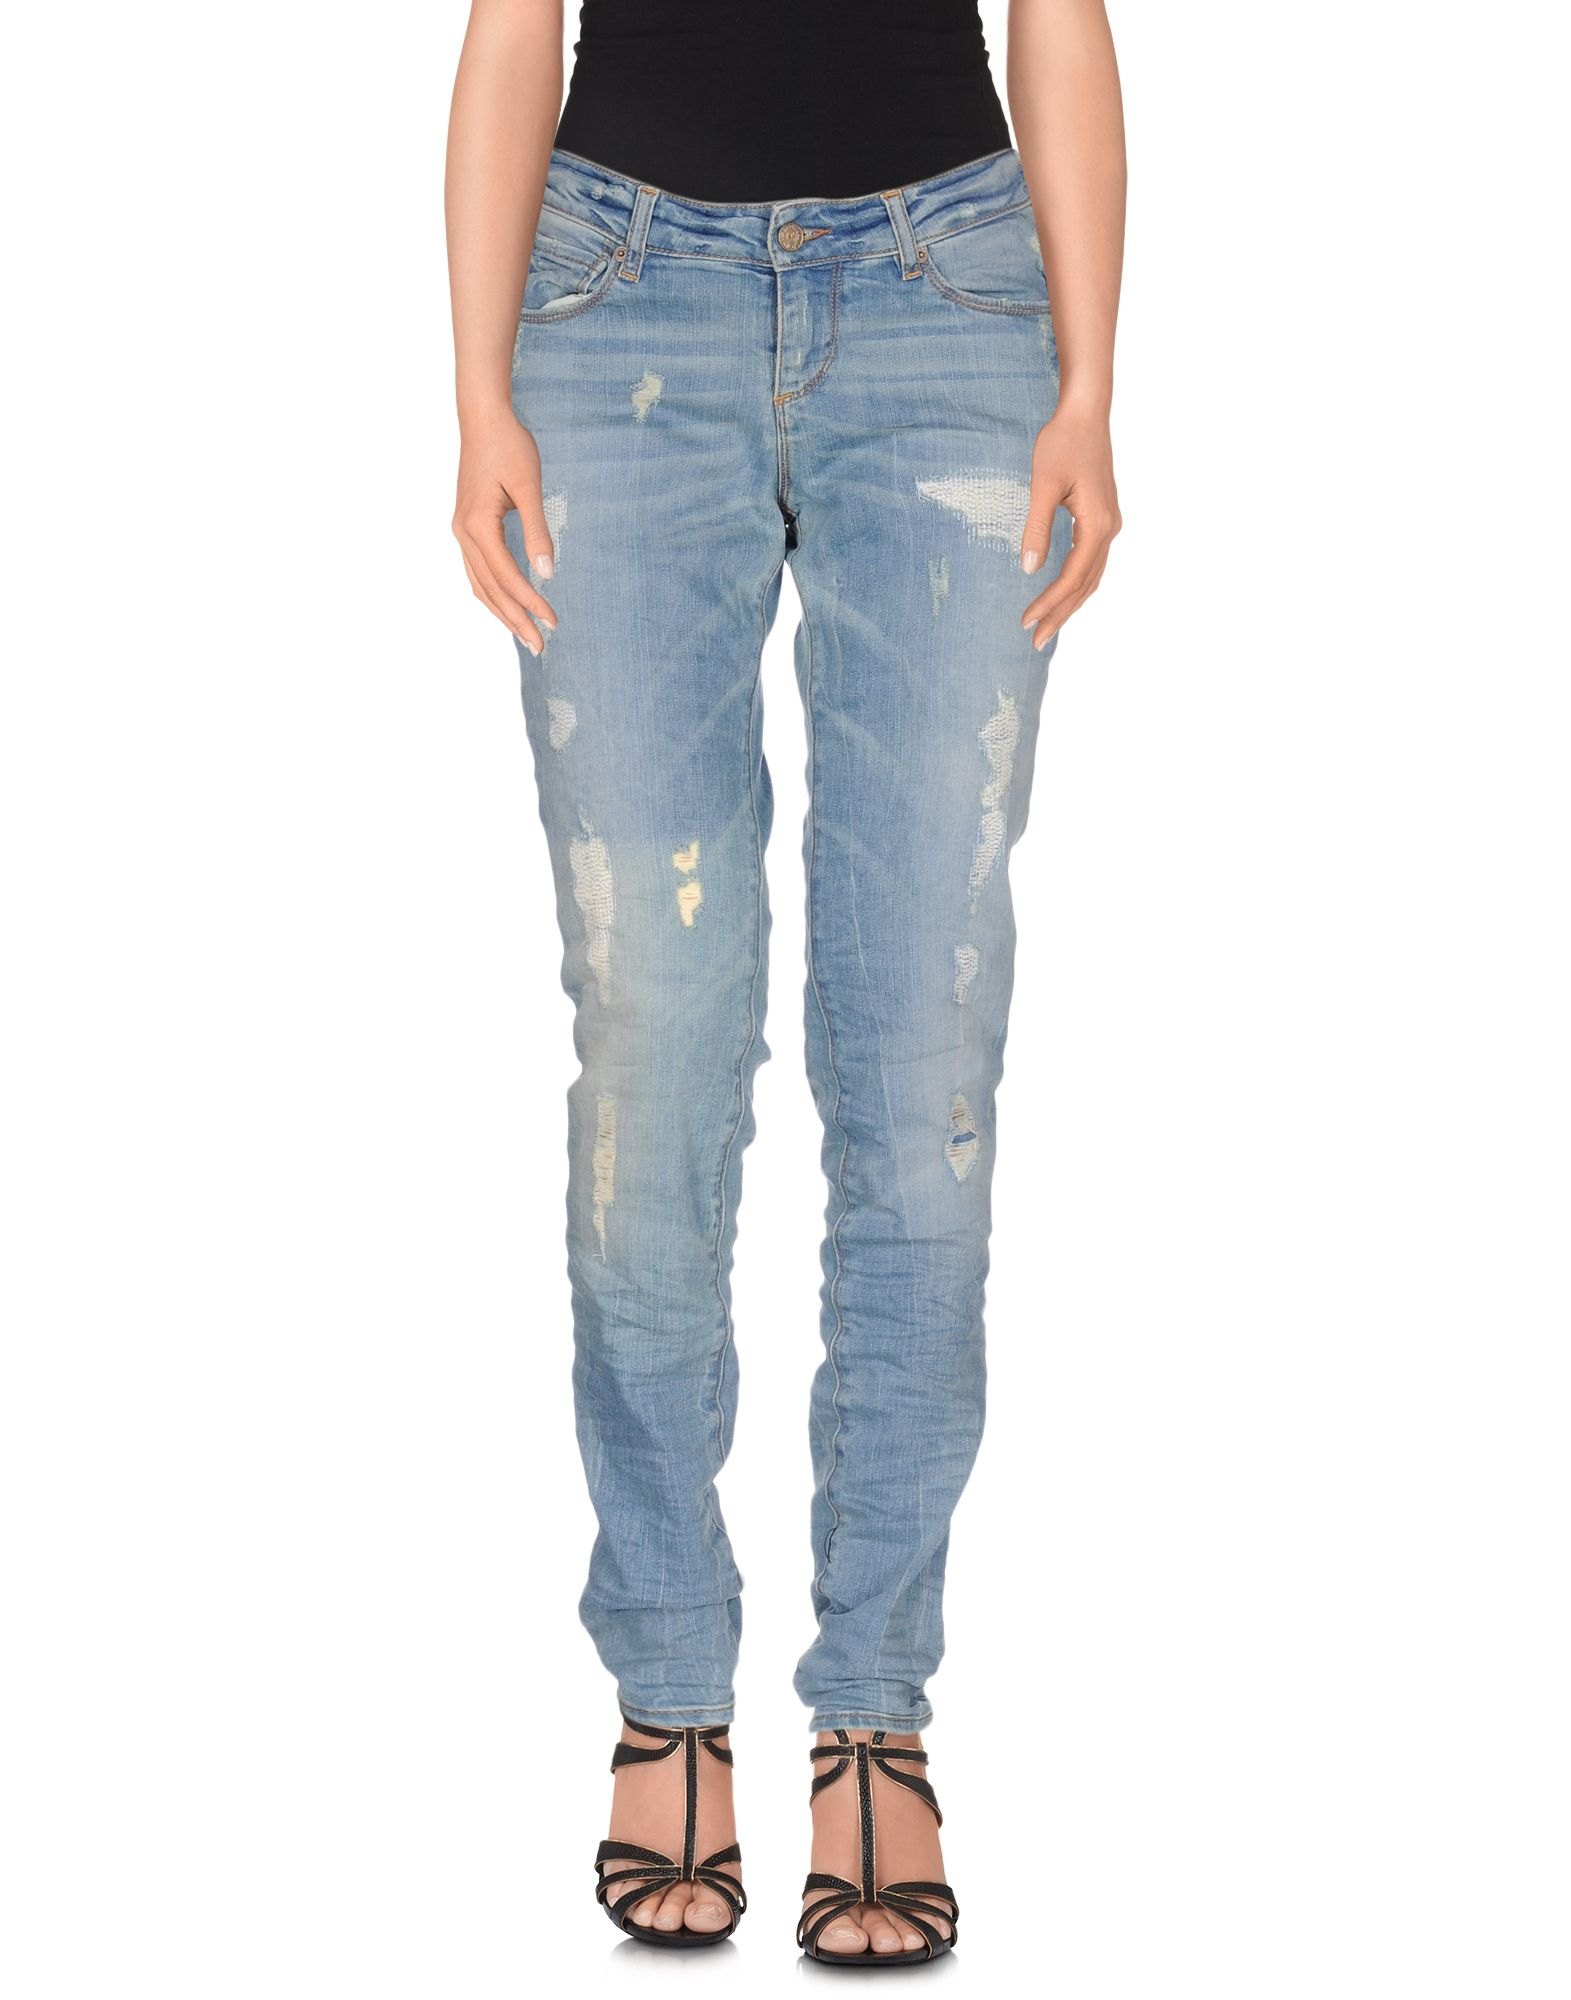 MAGAZZINI DEL SALE Джинсовые брюки magazzini del sale бермуды